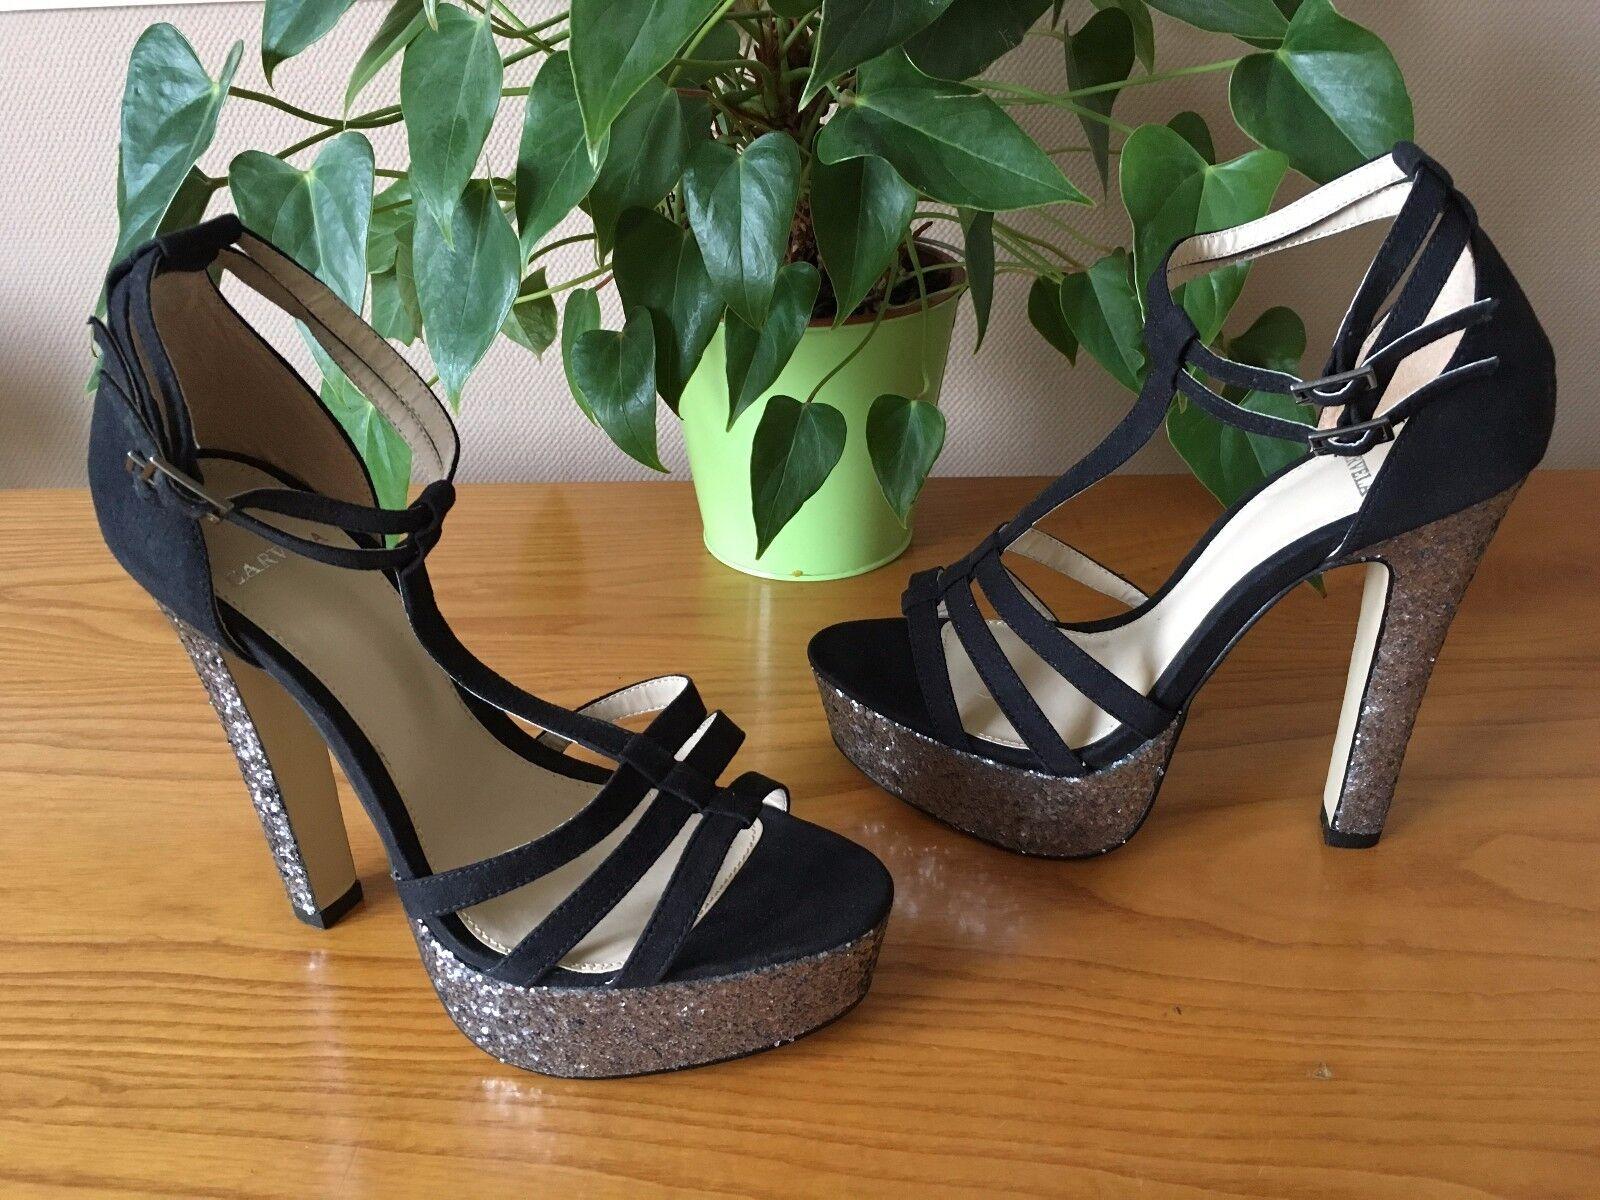 Ladies Carvela Kurt Geiger Lara black platform court shoe UK 5 EU 38 New